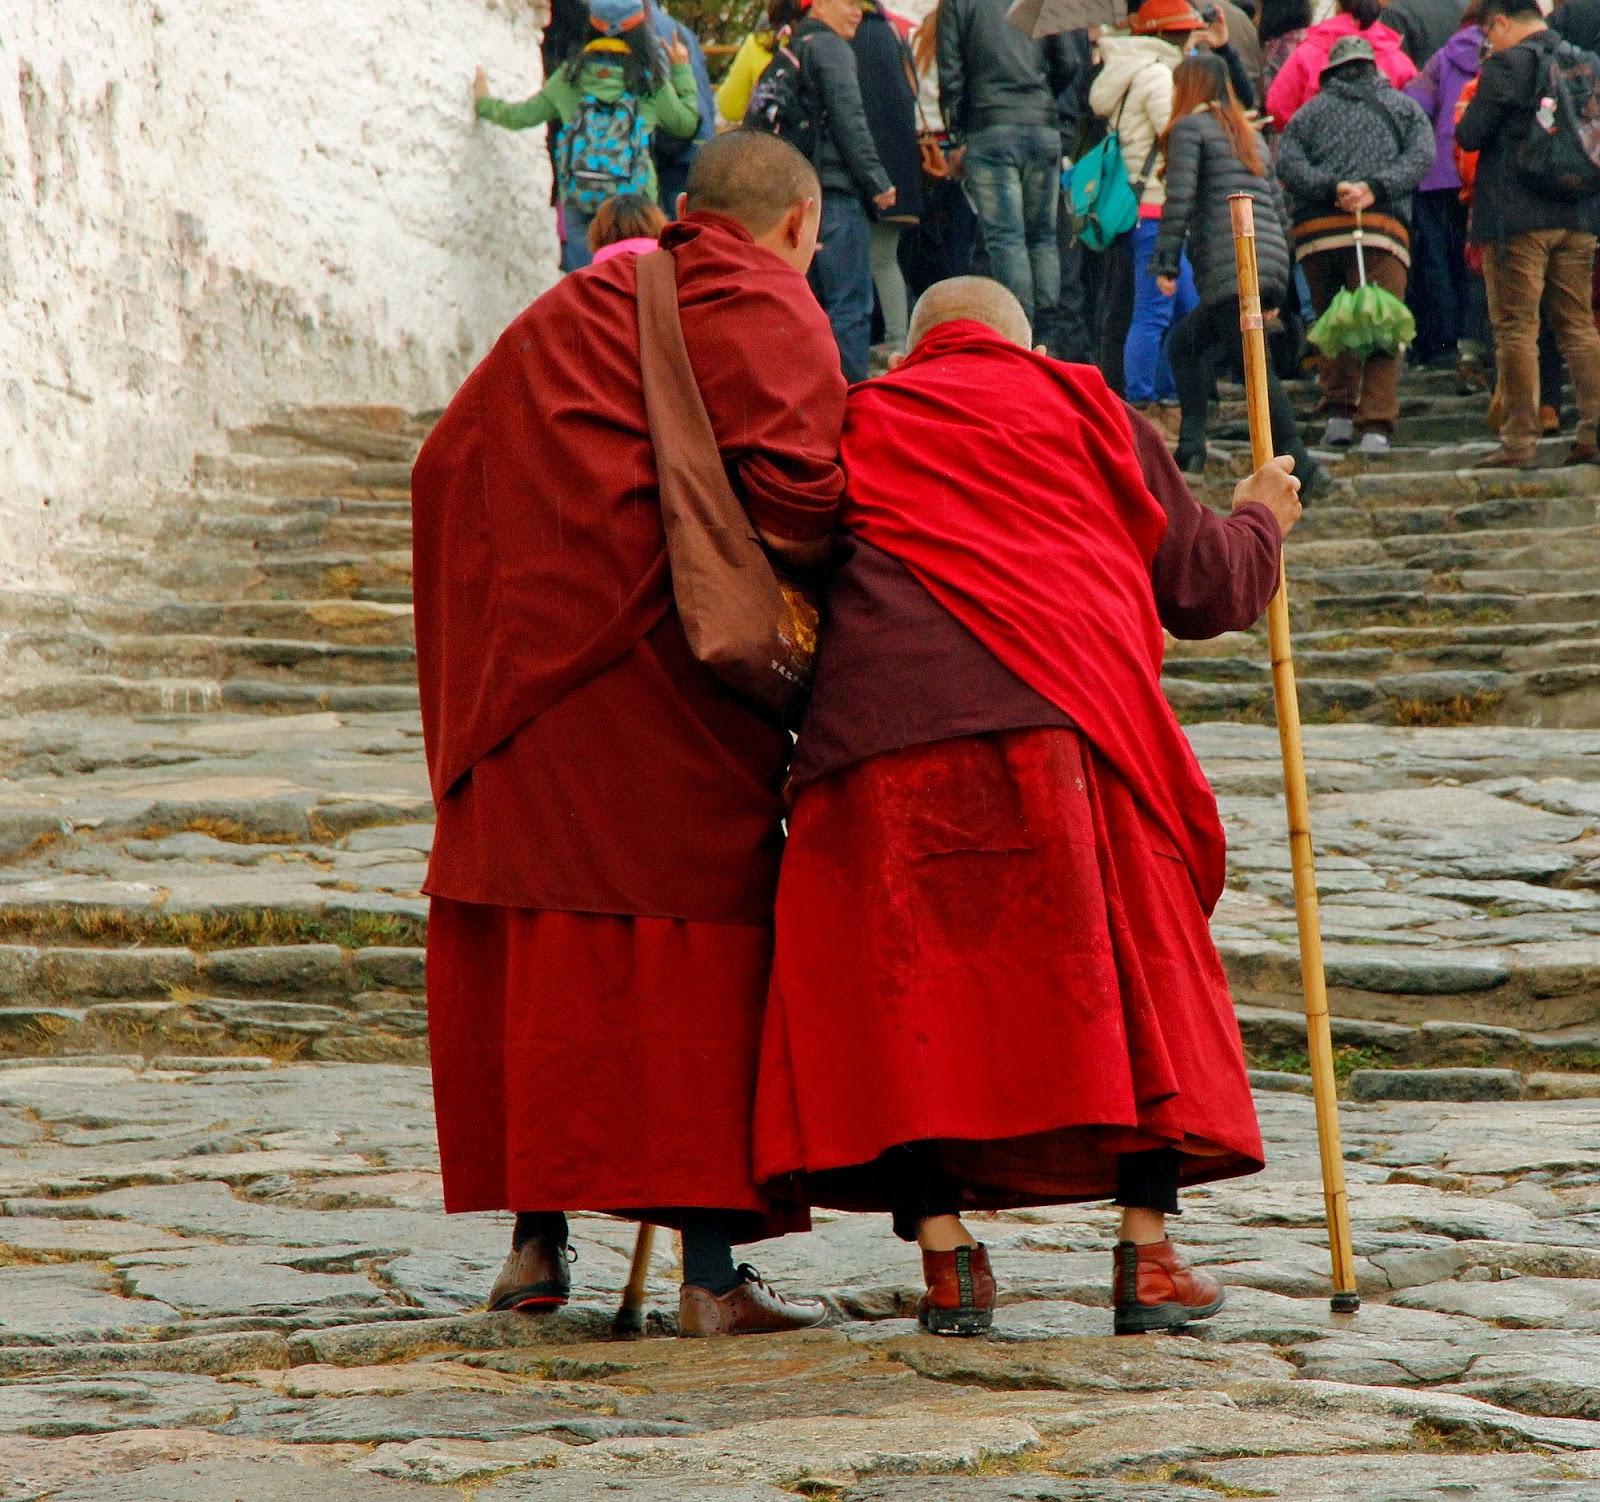 Monks walking up the Potala Palace